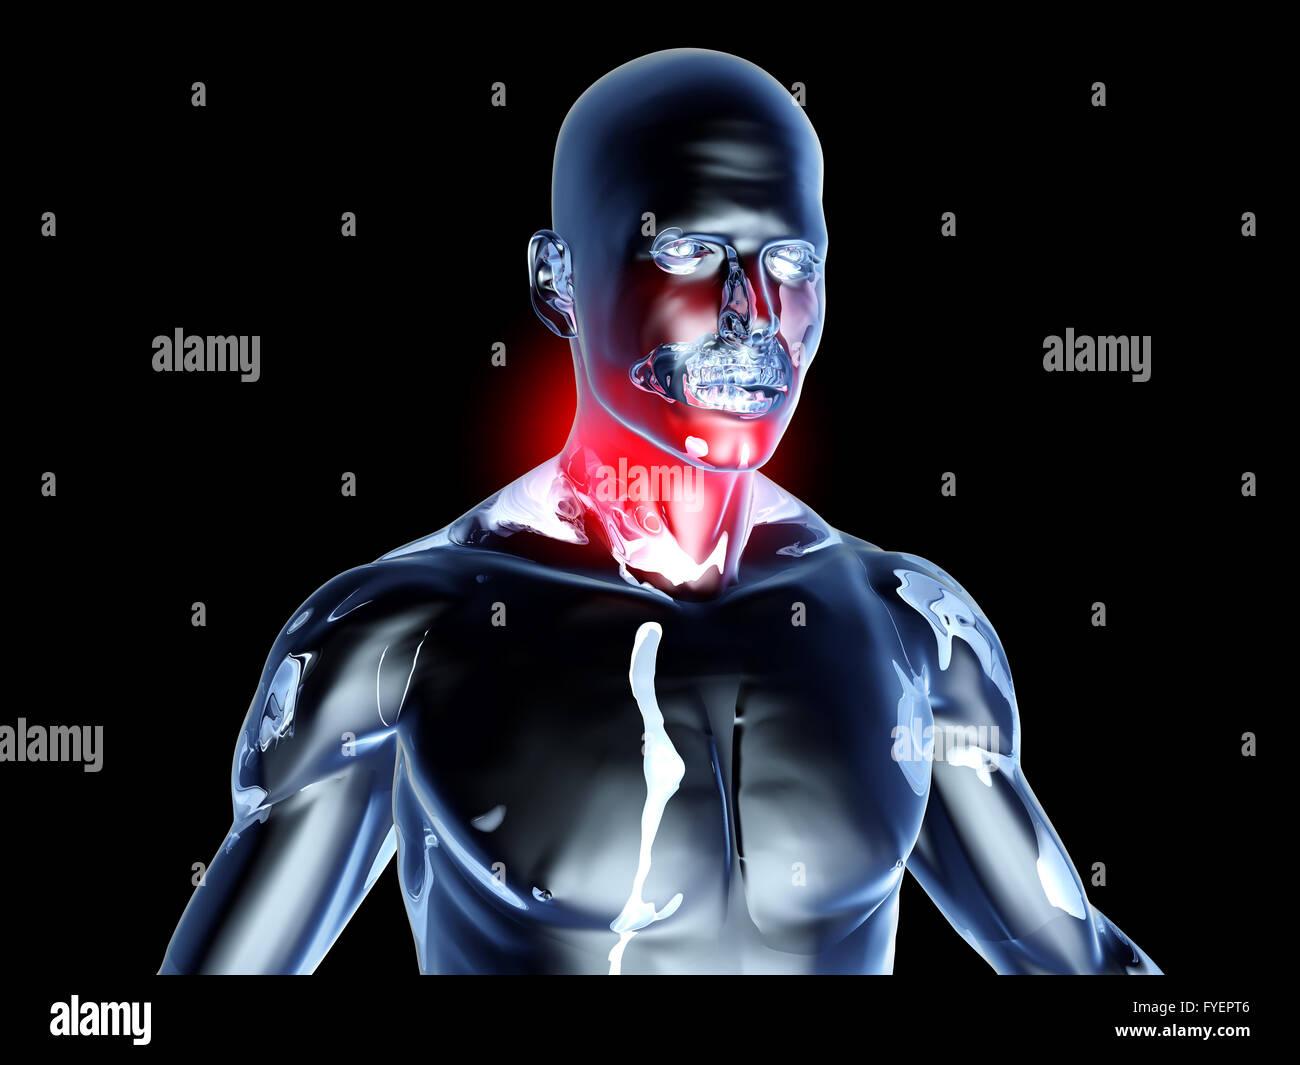 Sore Throat - Anatomy Stock Photo: 102972806 - Alamy